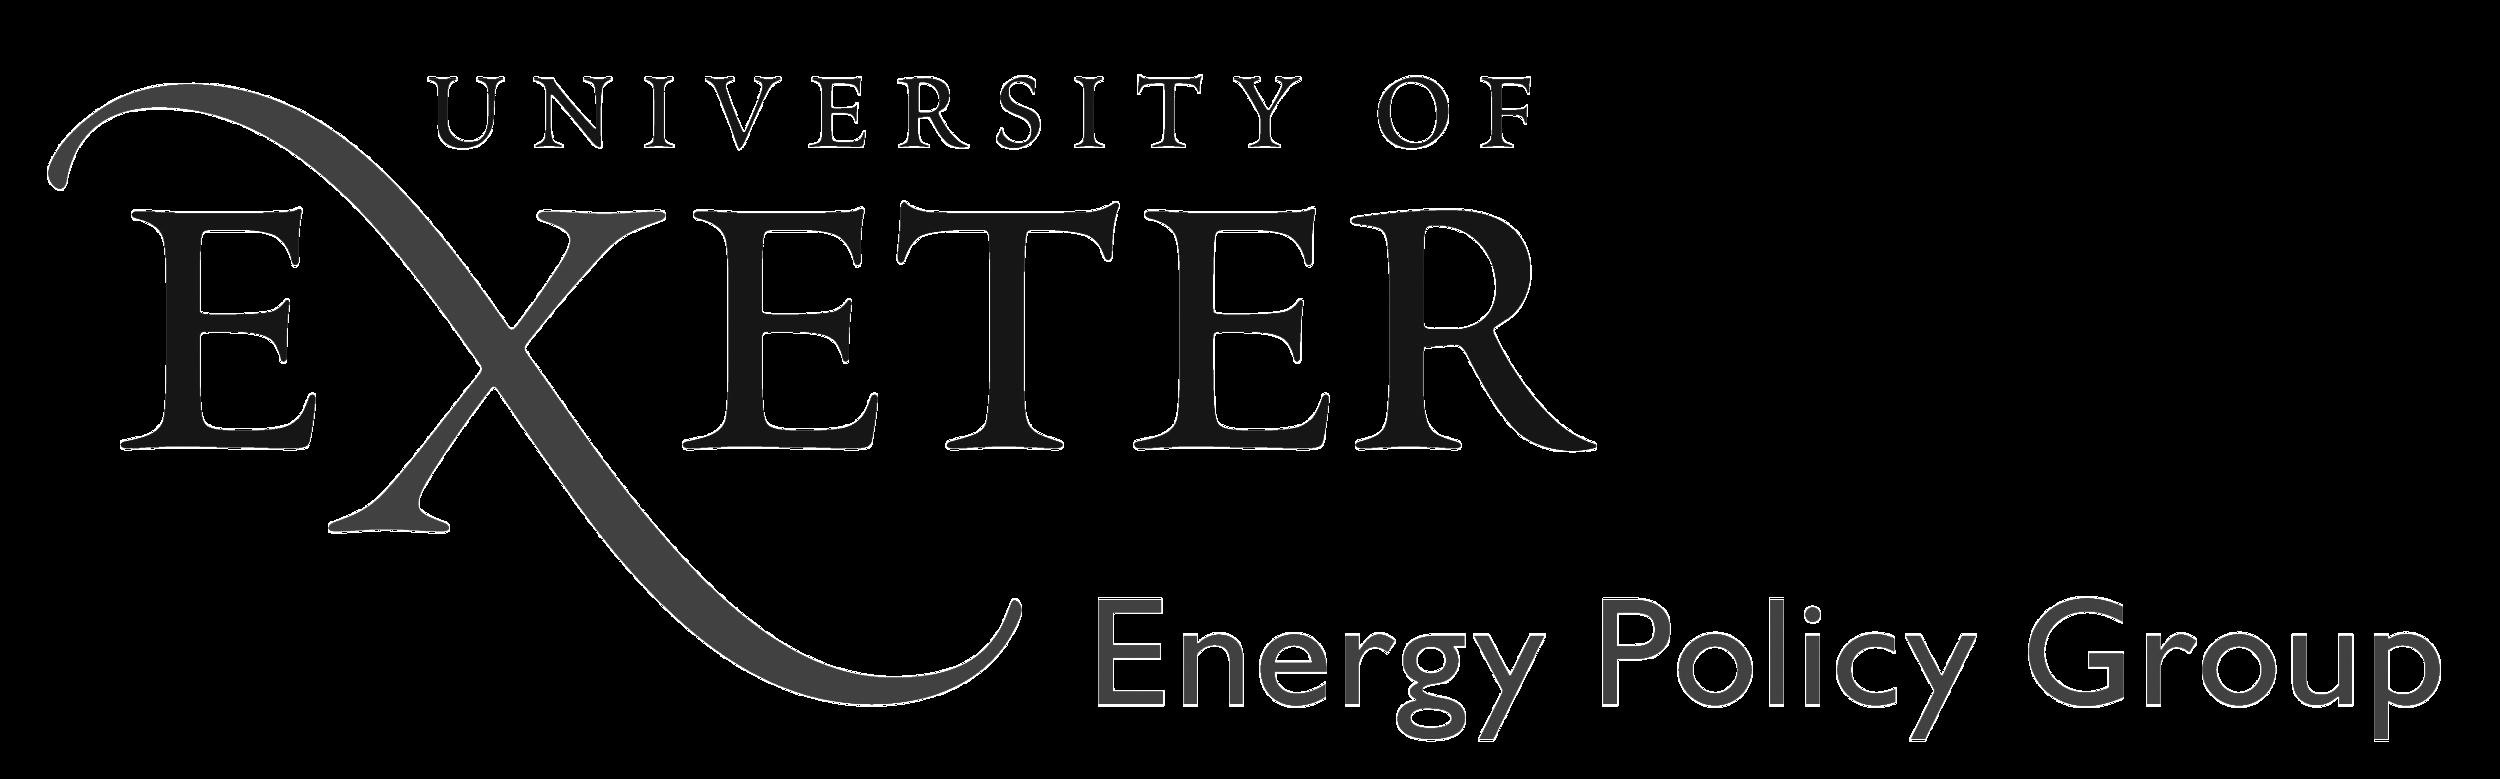 UoExeter-EPG-Lockup2.png